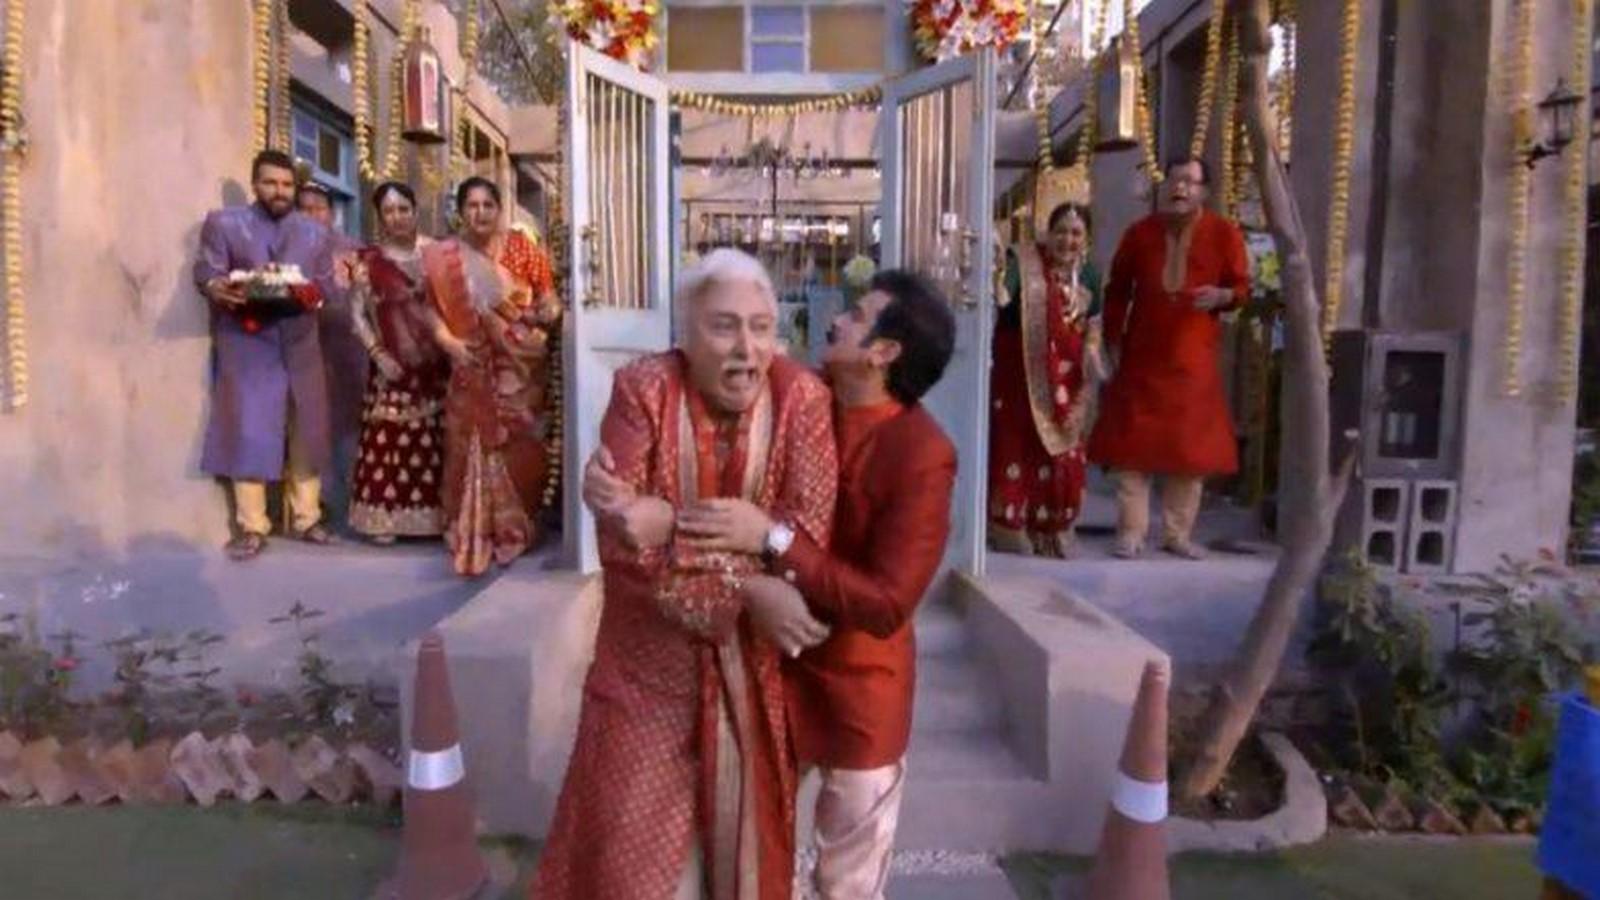 What Sarabhai vs Sarabhai teaches us about domestic architecture - Sheet1